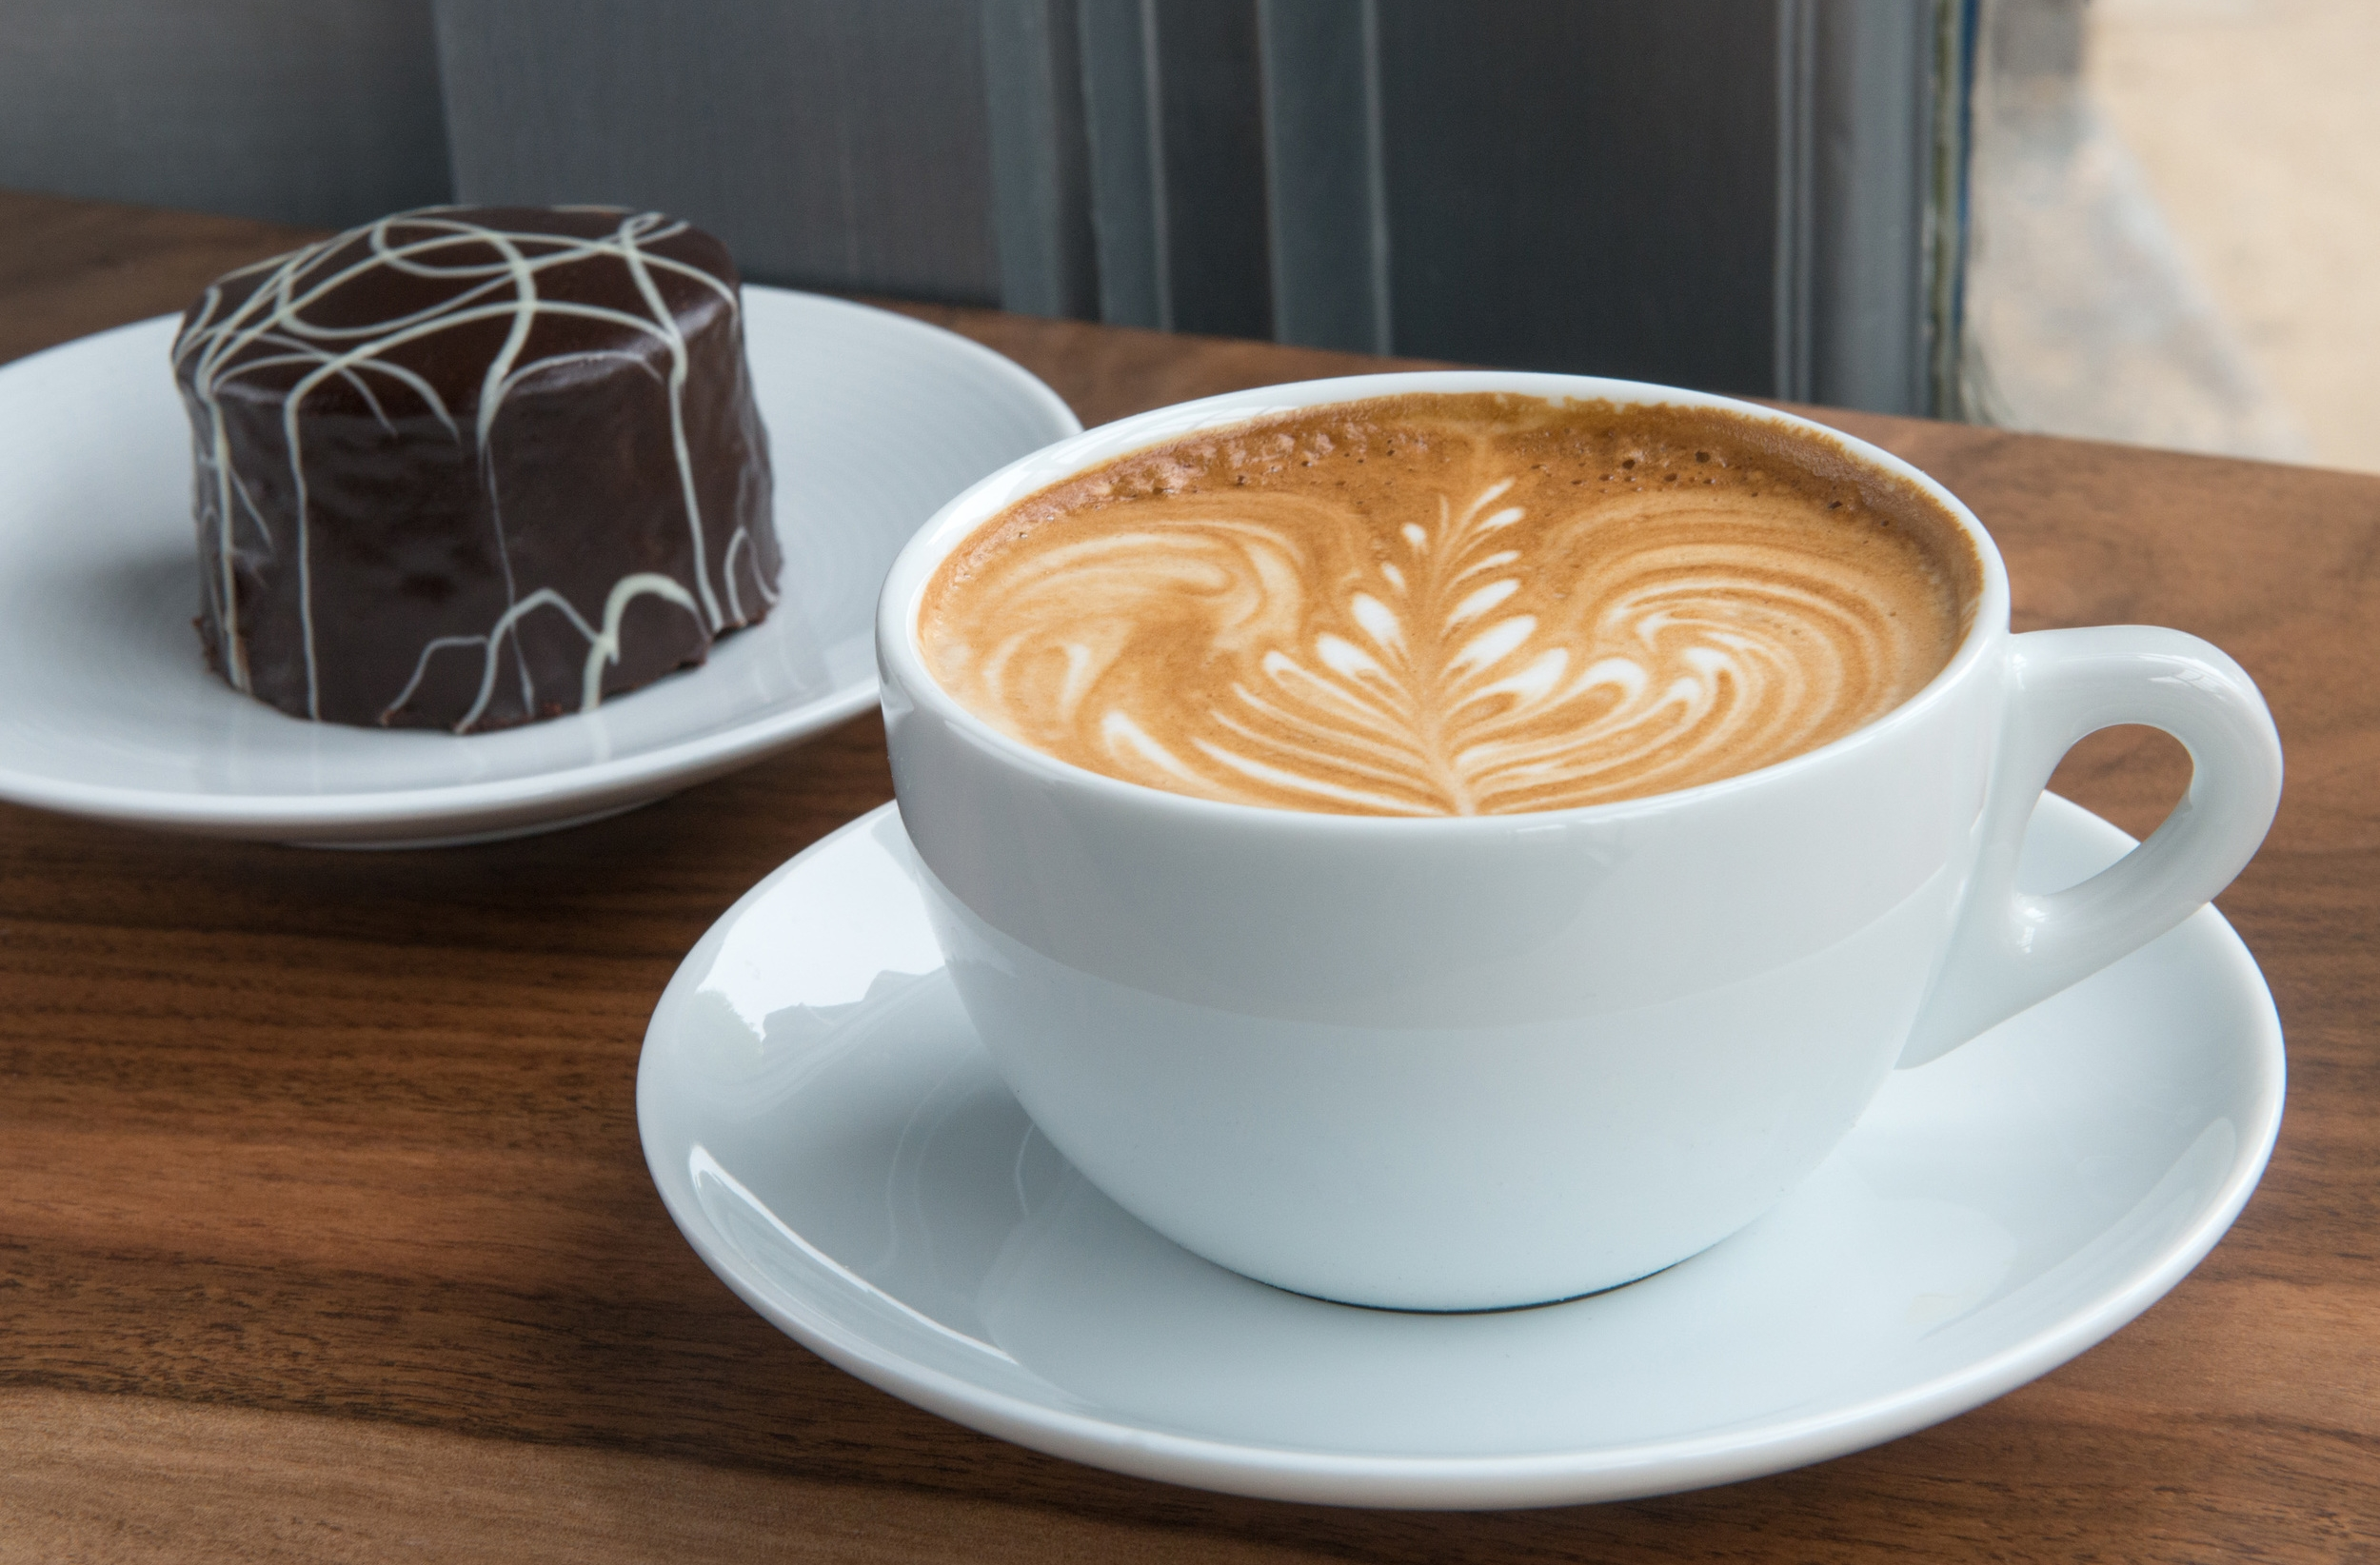 Caffe Latte from our Espresso Bar